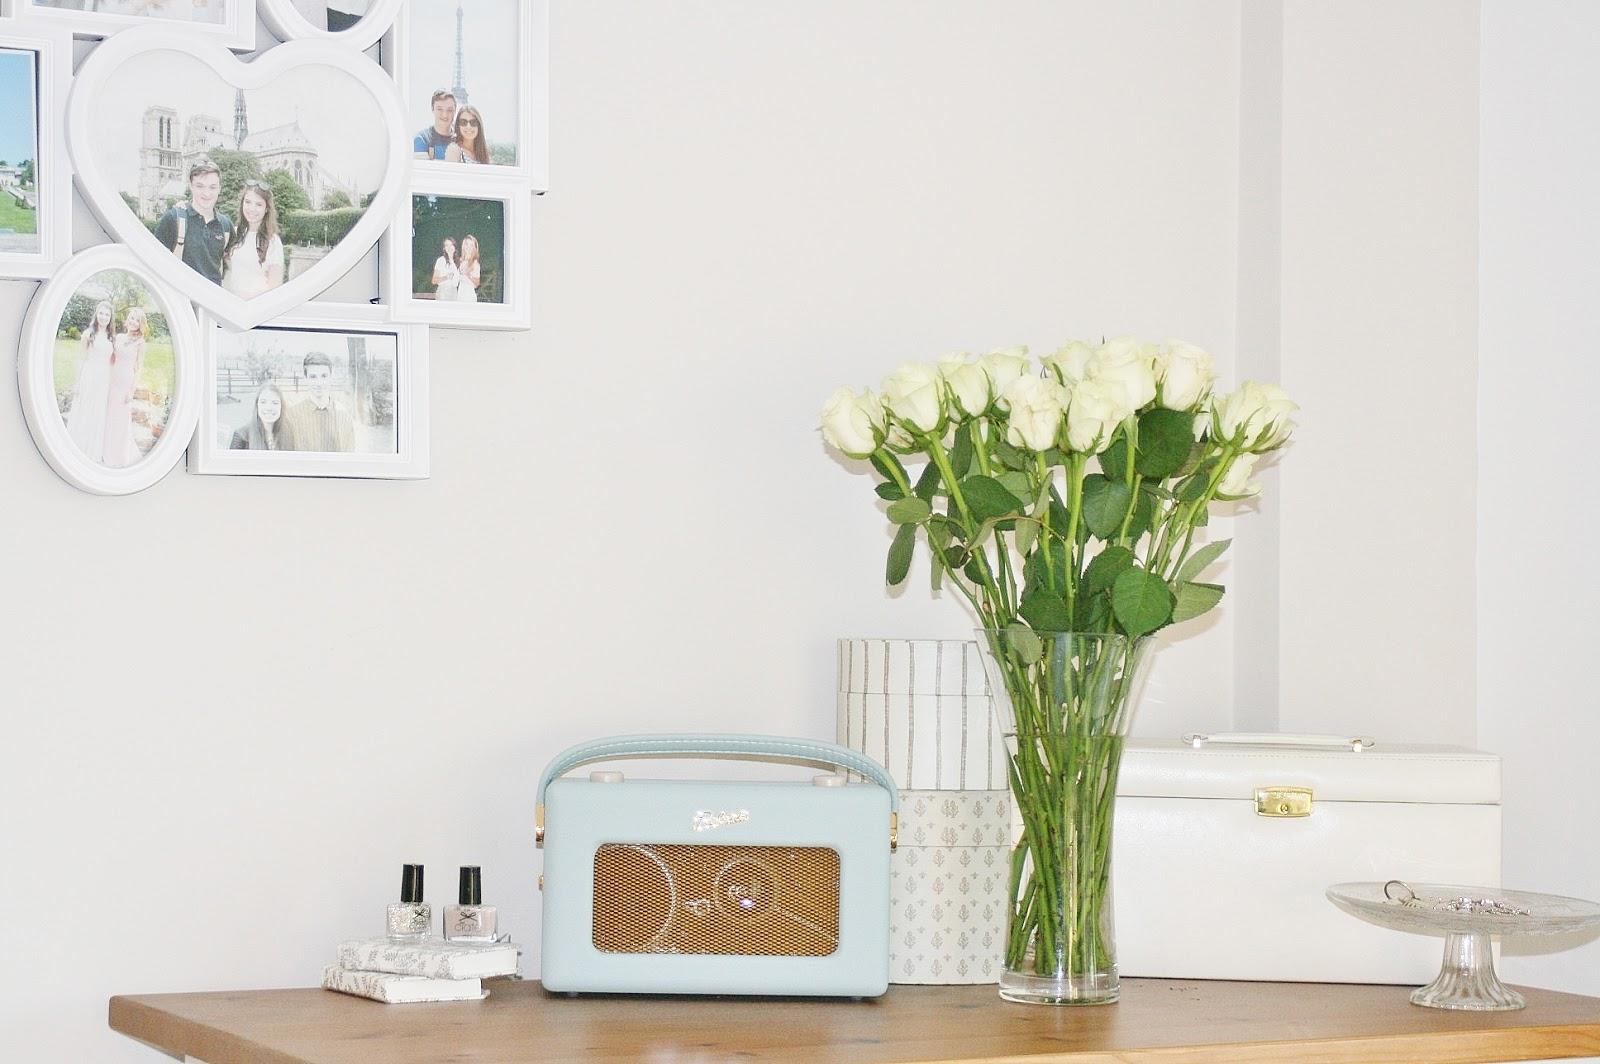 Katherine Penney Chic Bedroom Decor Interior Flowers Roses White Cream Radio Pictures